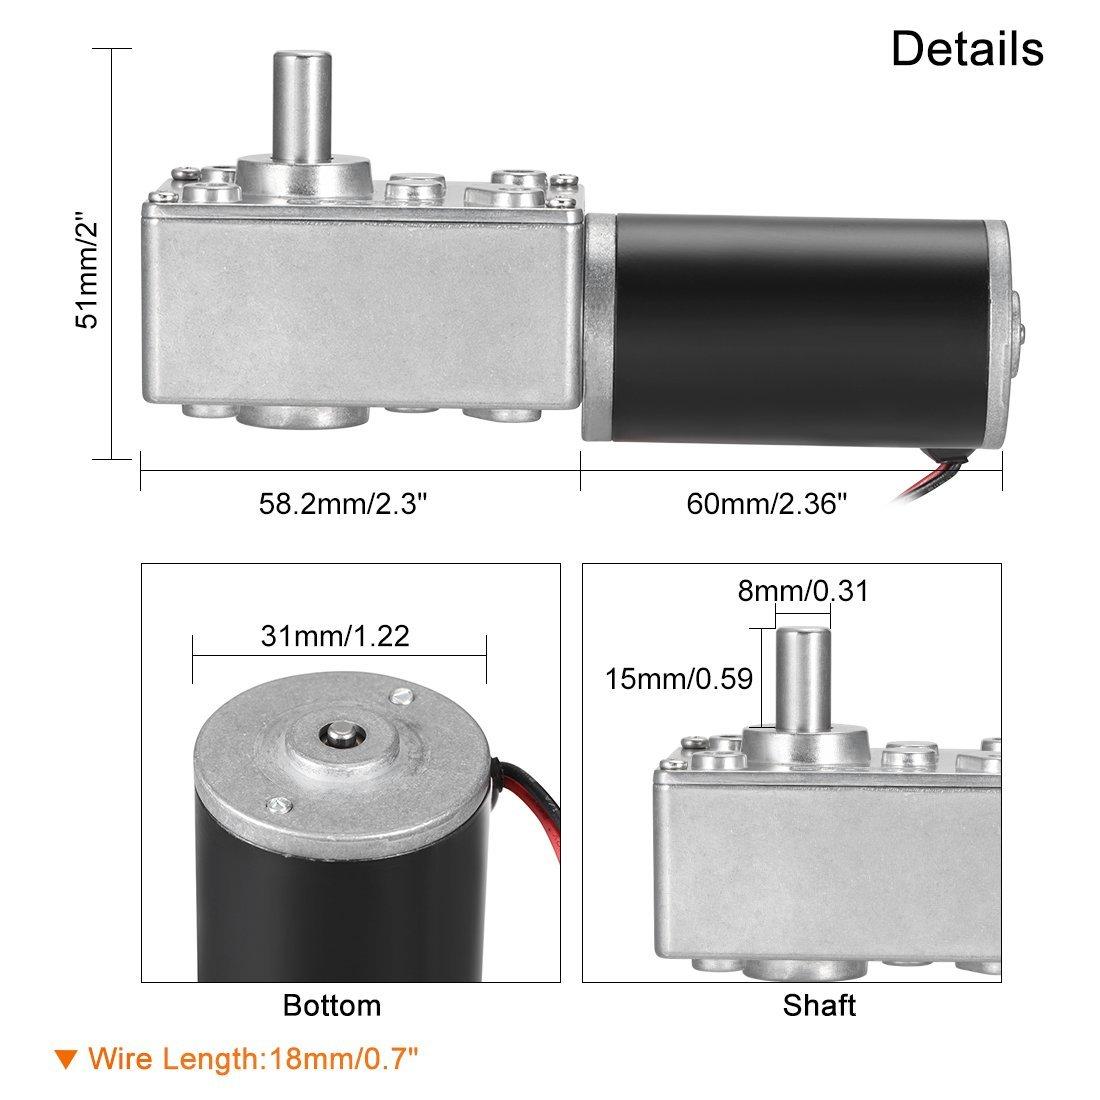 uxcell DC12V 65RPM High Torque Electric Power Speed Reduce Turbine Worm Gear Box Motor